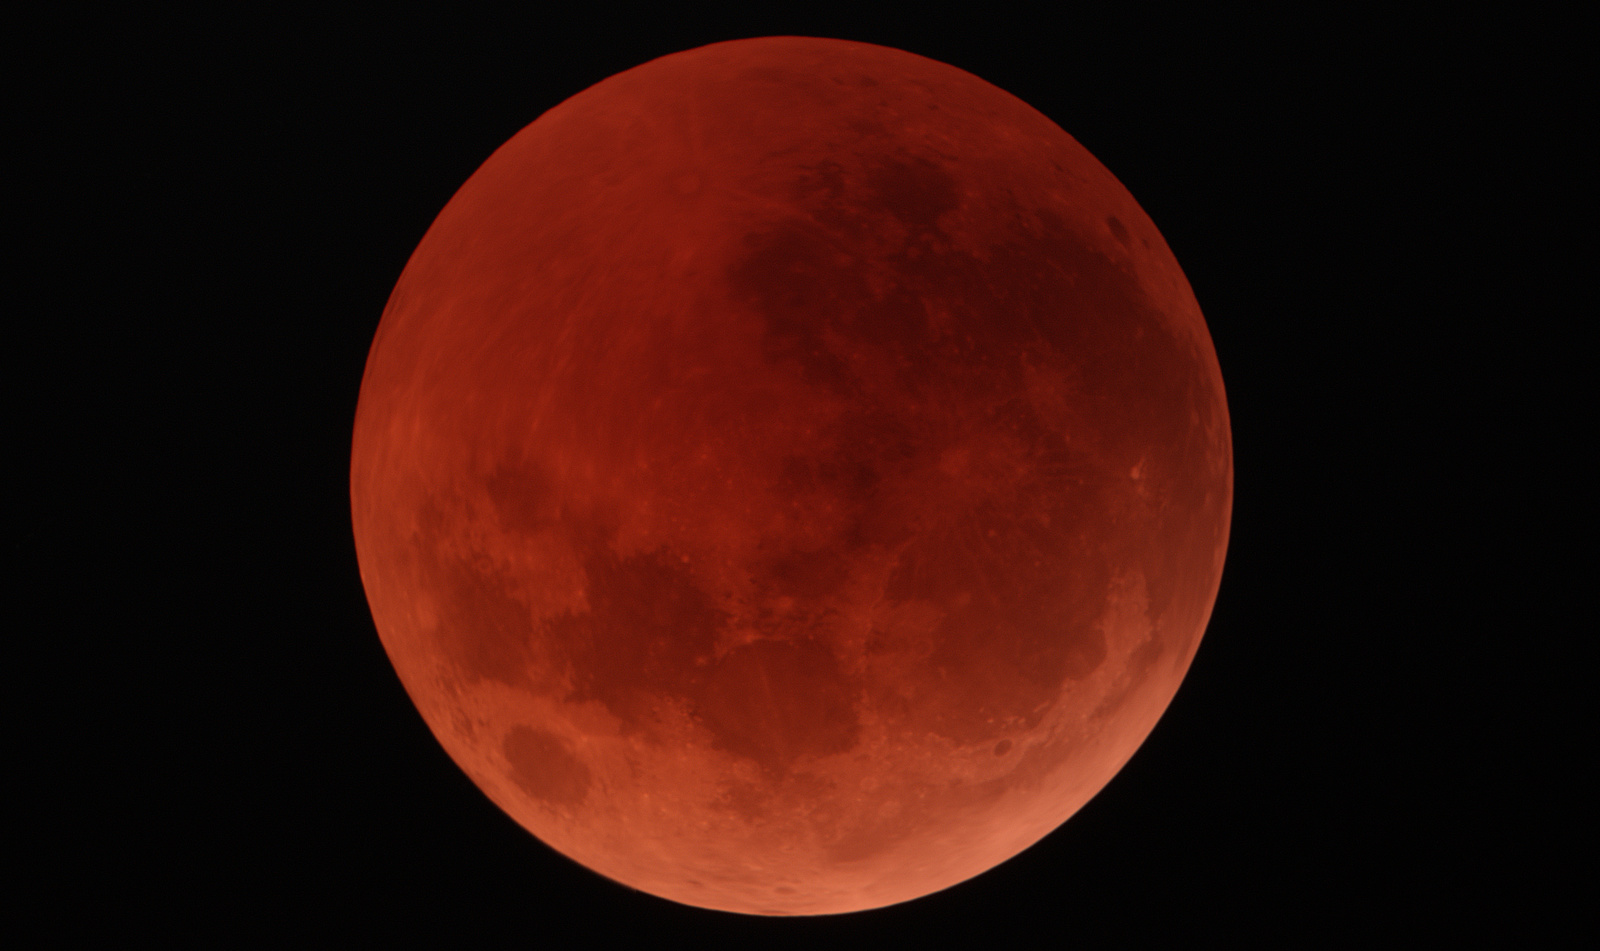 Moon-Eclipse-Wczesne_kadr2.thumb.jpg.e600a2c839a51c3a5fab1b229fba82ea.jpg